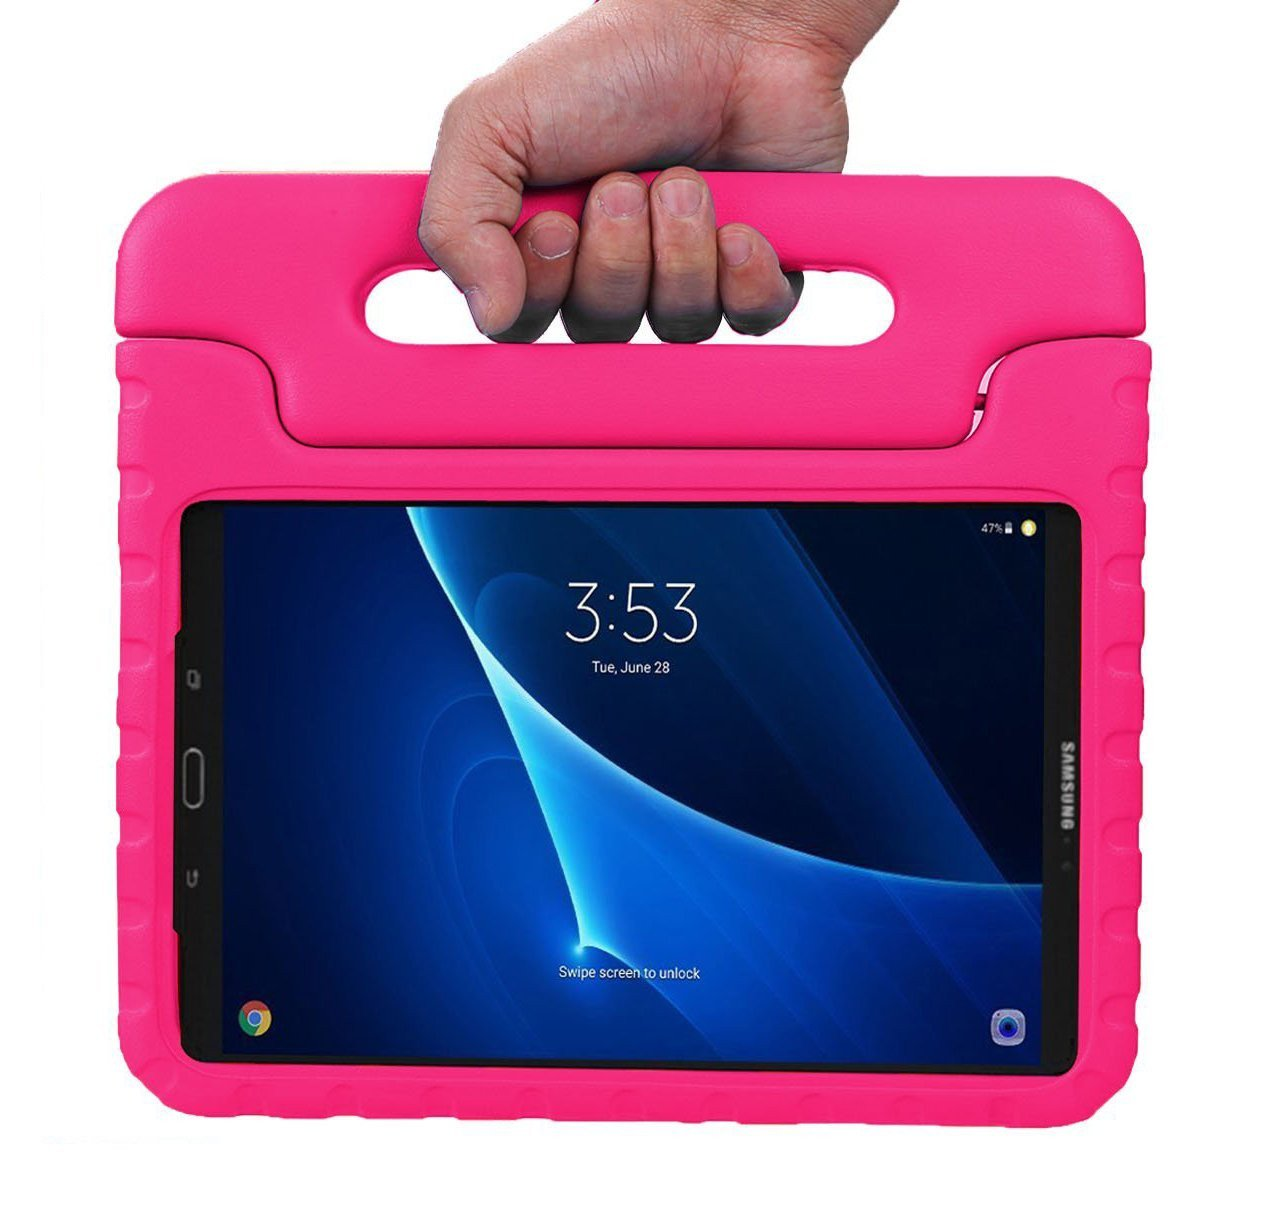 Kinder Tablet Roze.Kinder Hoesje Samsung Galaxy Tab A 10 1 2019 Roze